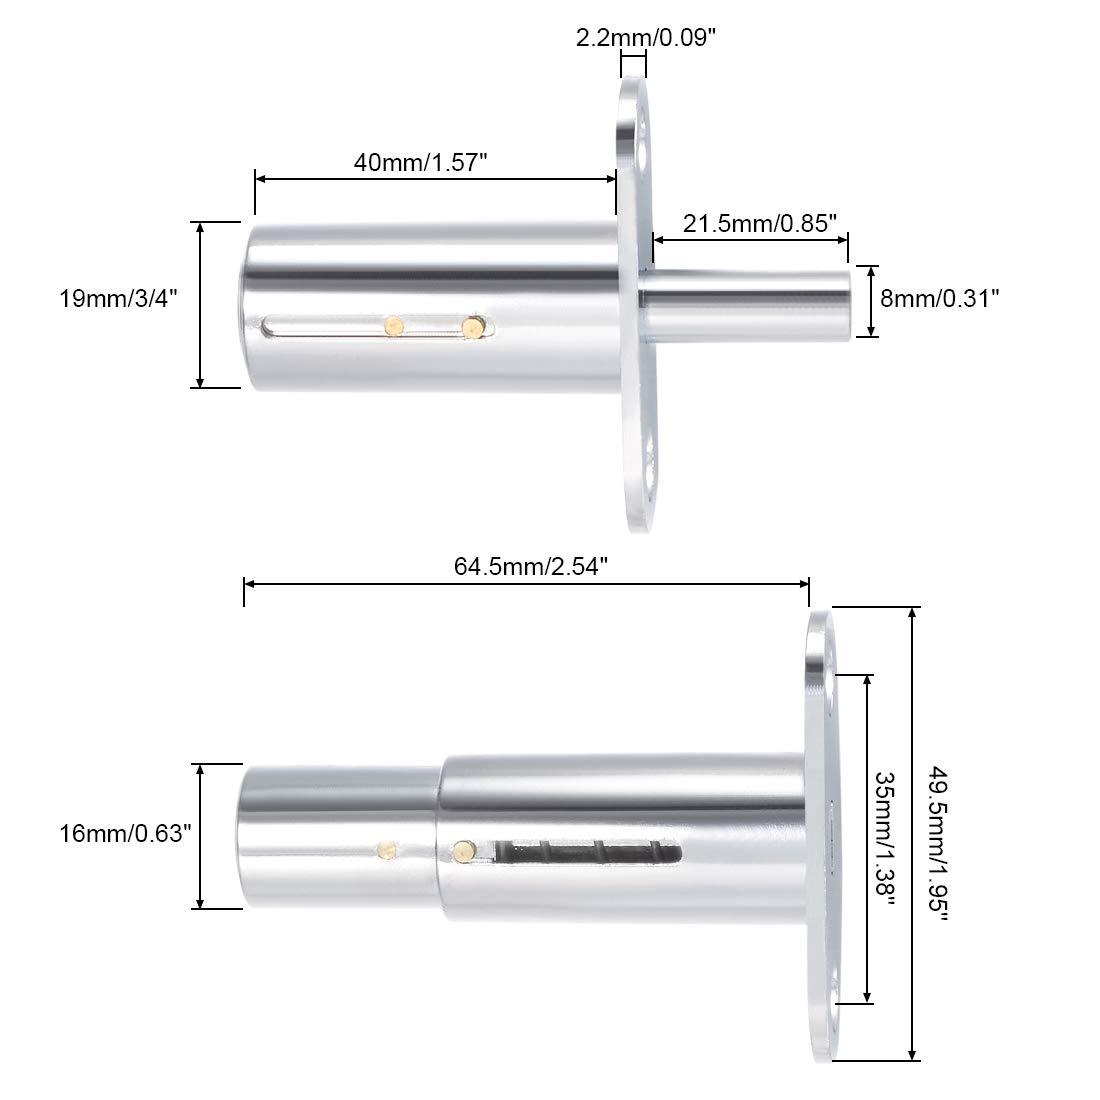 uxcell 19mm Dia Cylinder Head Silver Tone Metal Sliding Door Plunger Lock w Keys